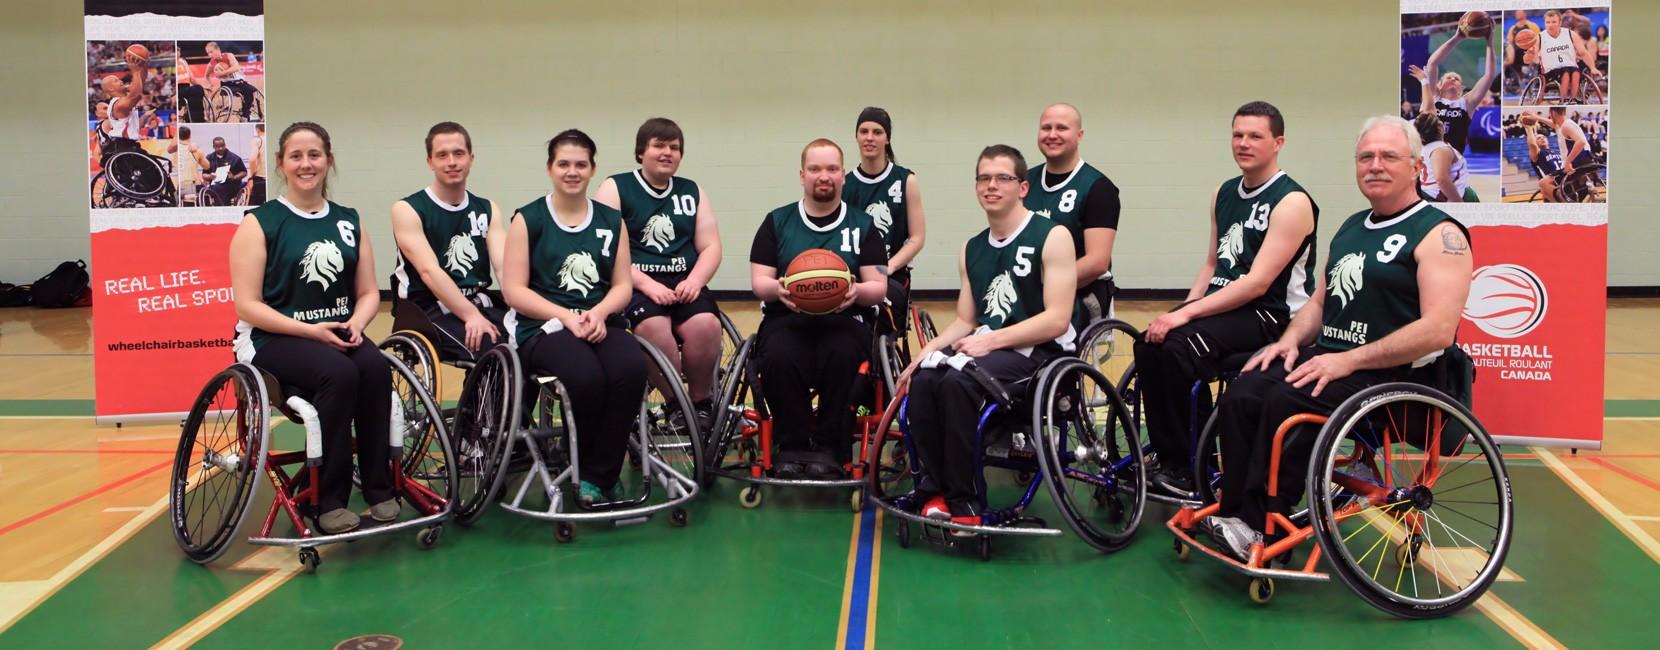 WheelchairBasketball